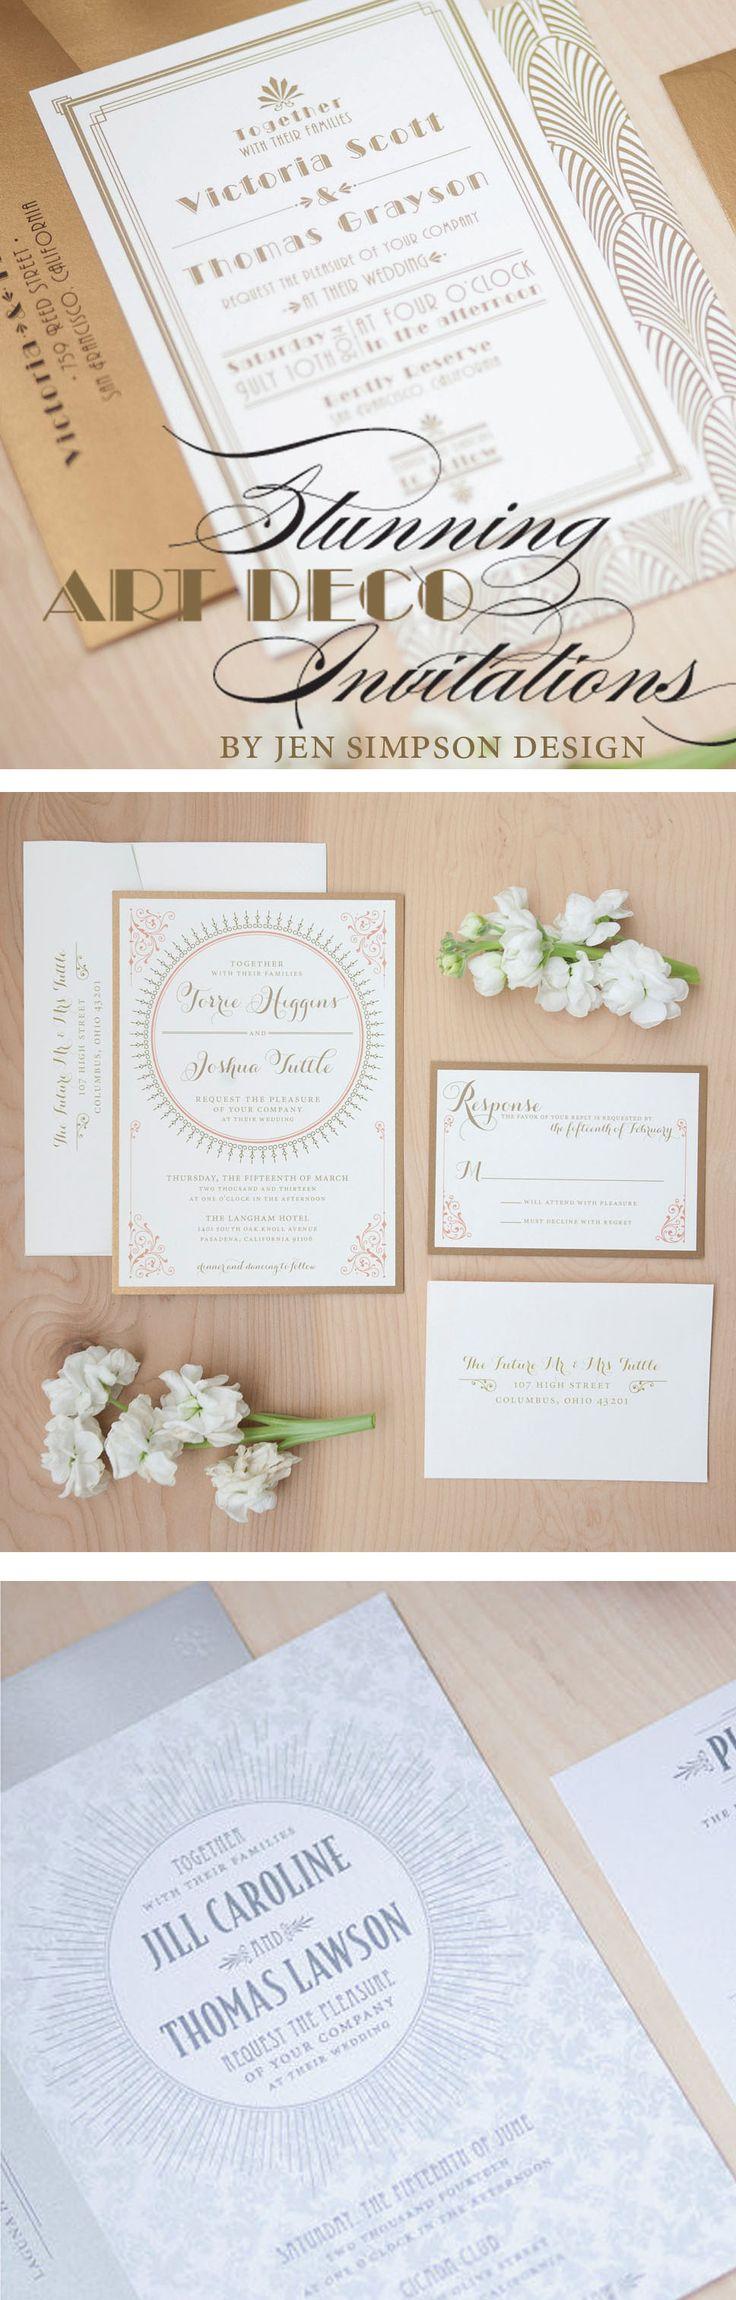 347 Best Wedding Invitation Inspiration Images On Pinterest